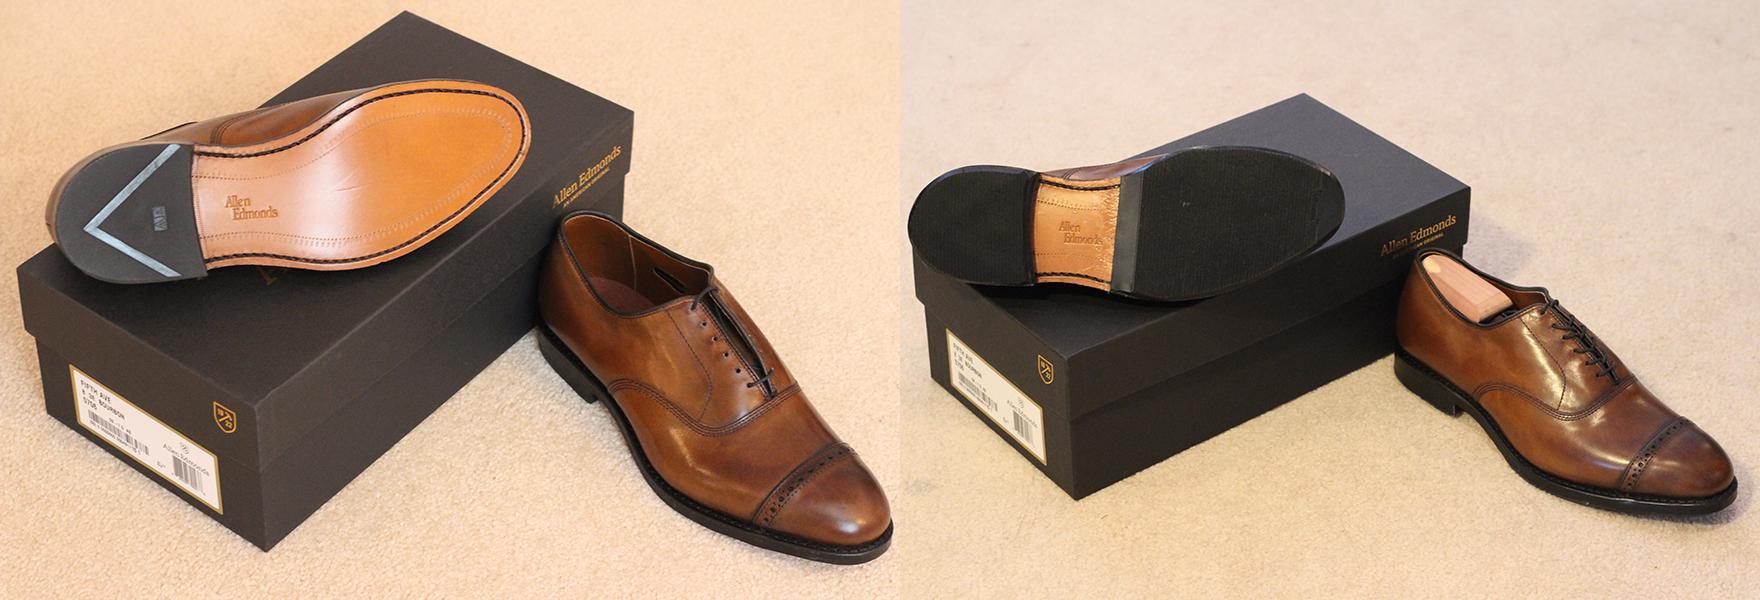 dress shoes with vibram soles